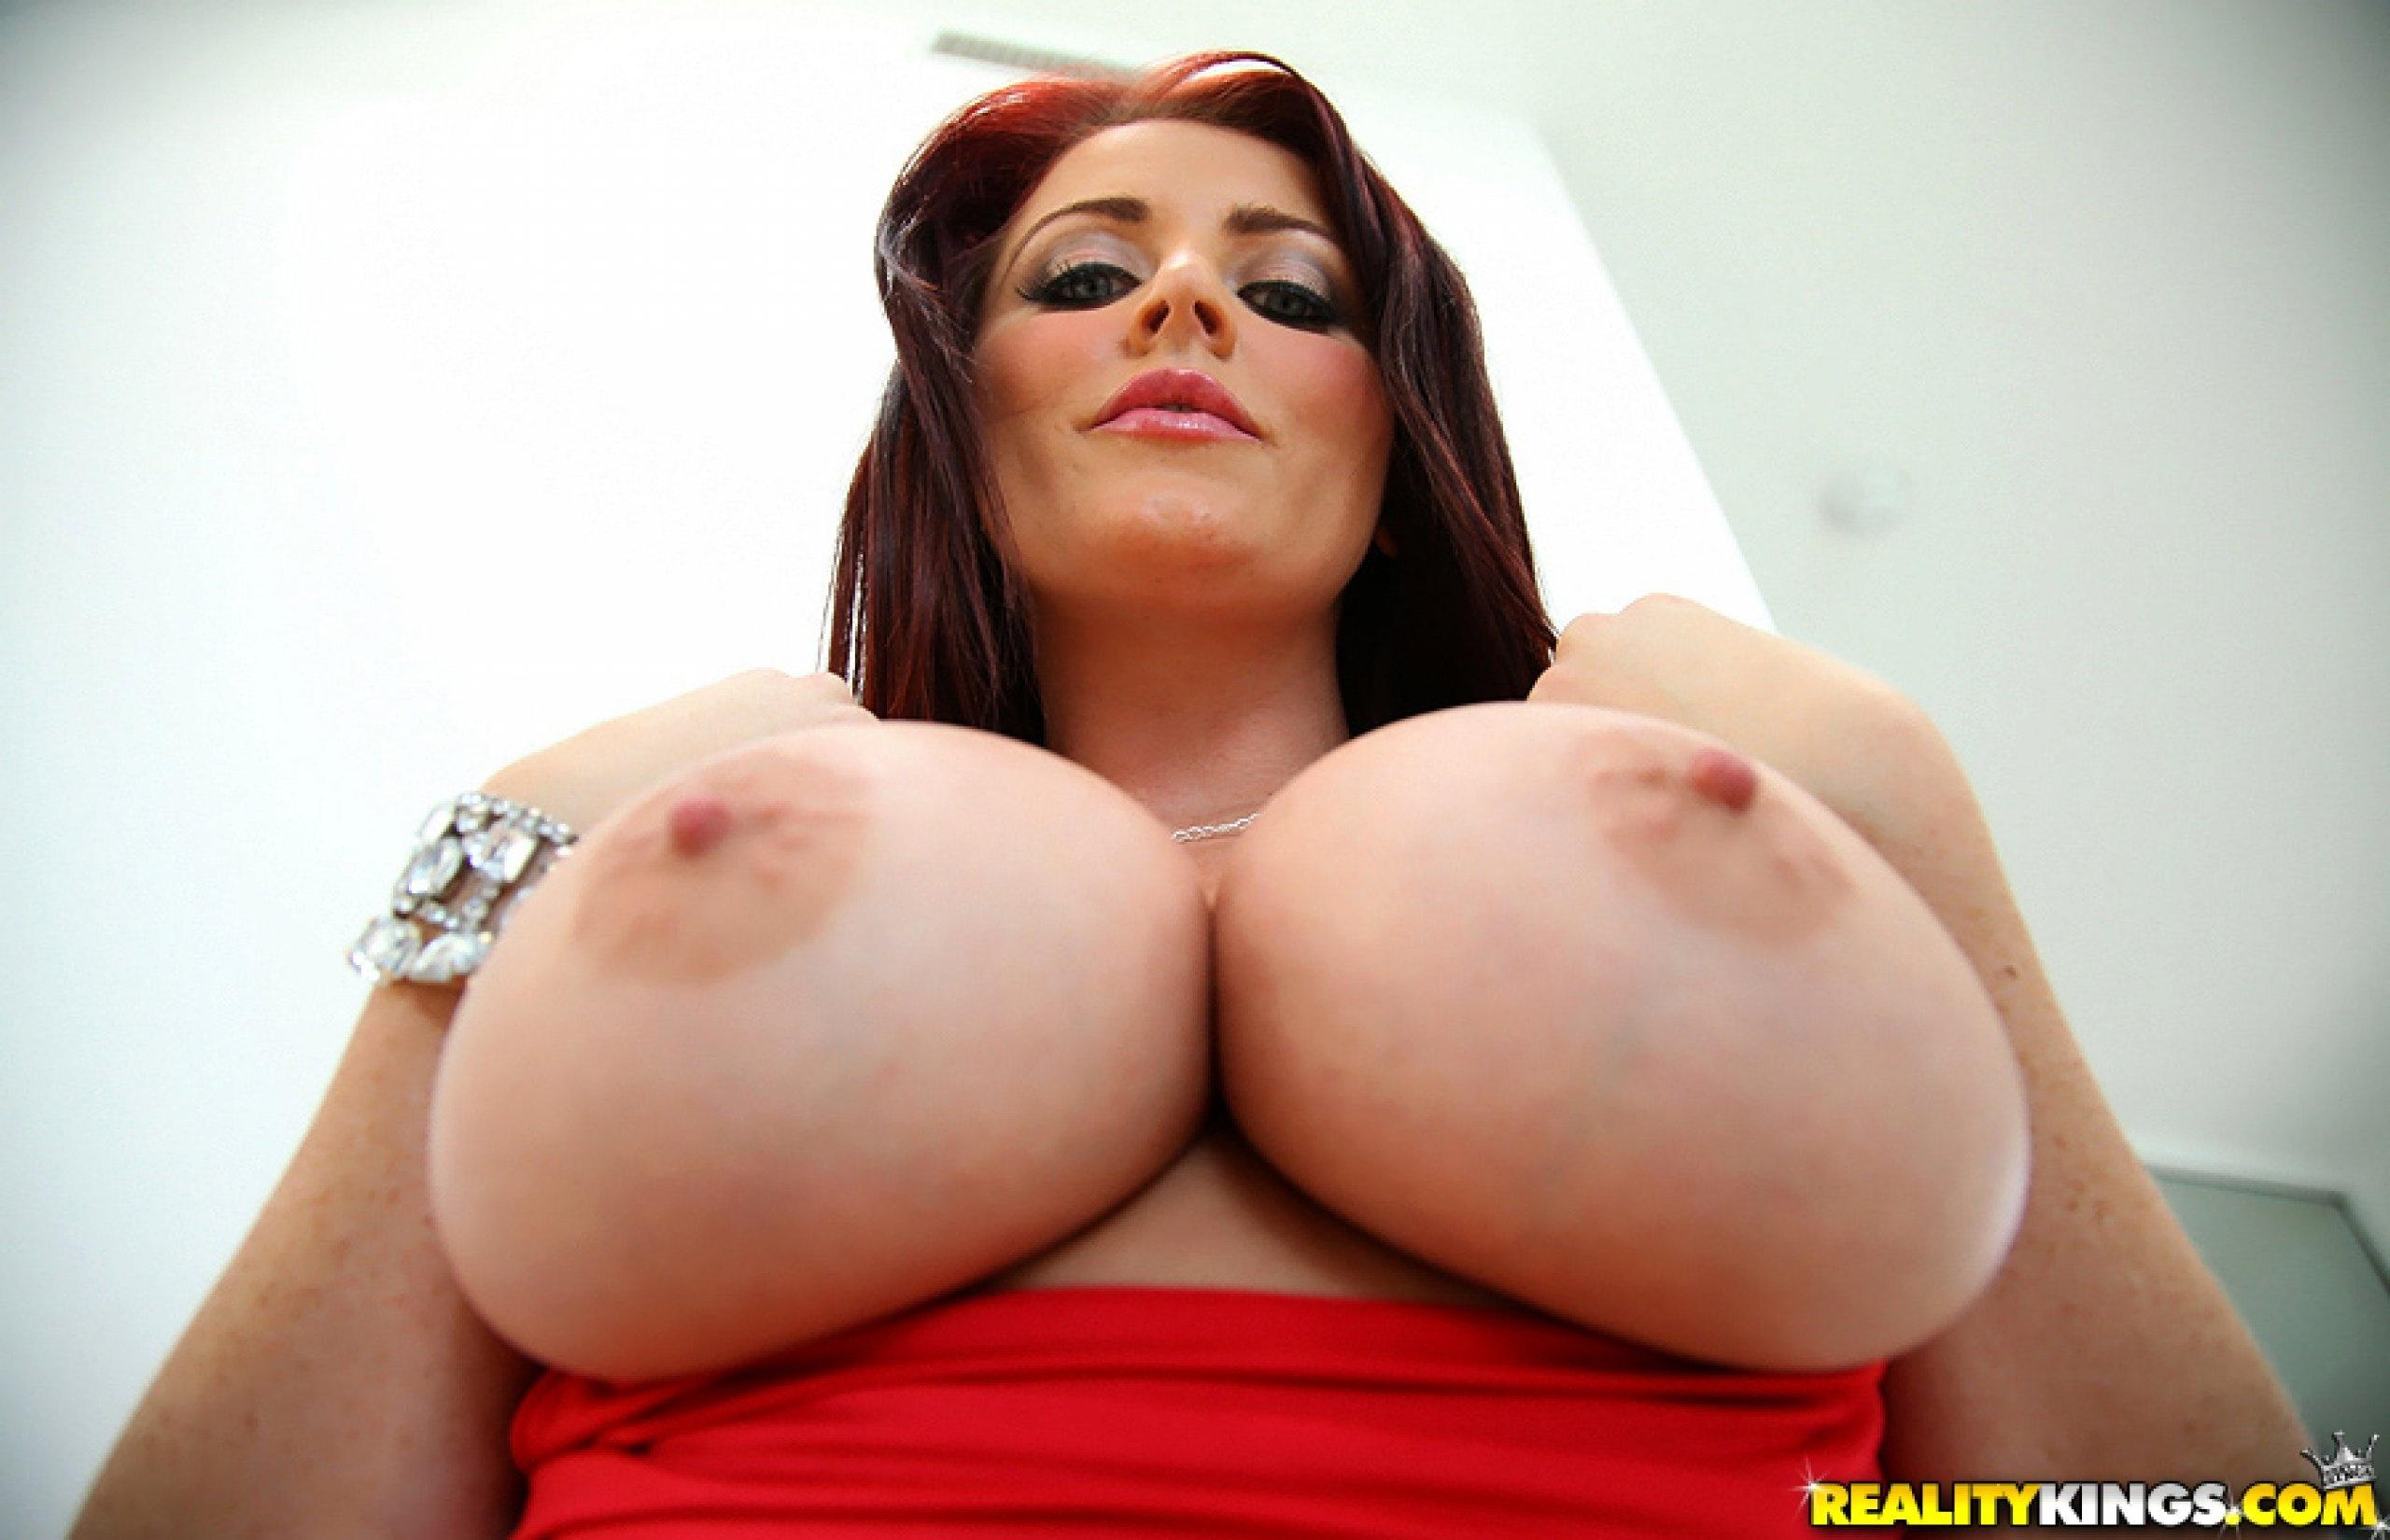 Pornstars With the Best Fake Tits - IFL